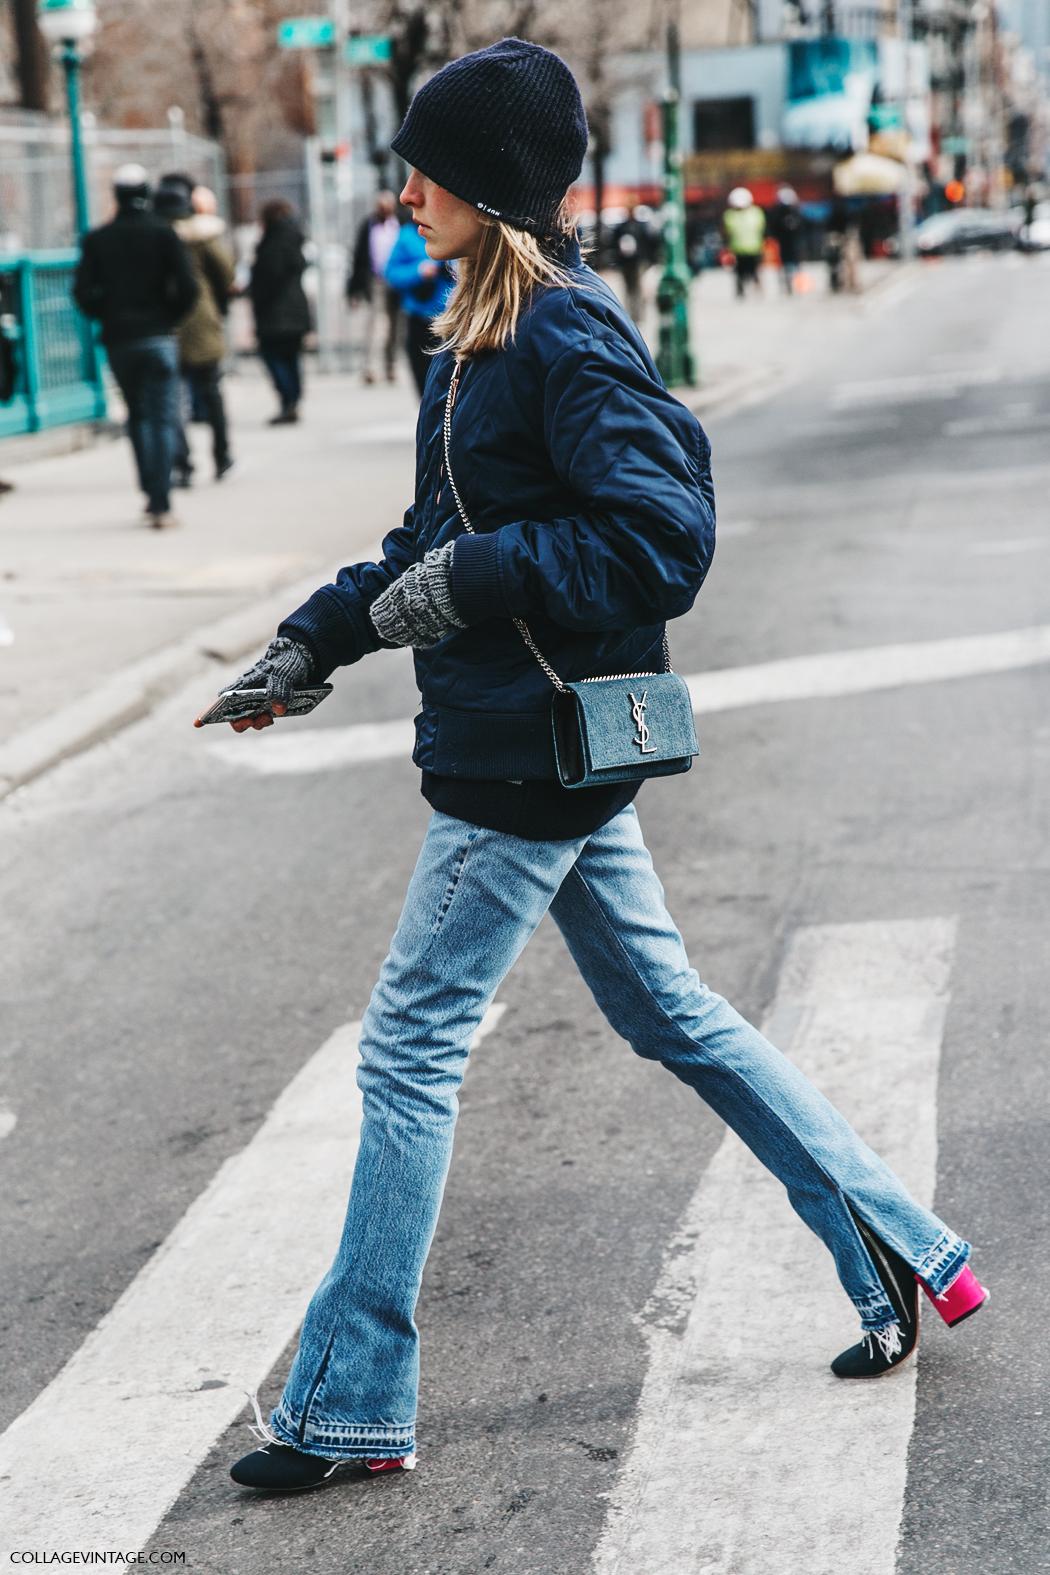 NYFW-New_York_Fashion_Week-Fall_Winter-17-Street_Style-Saint_Laurent_Bag-Jessica_Minkoff-Jeans-Bomber-1